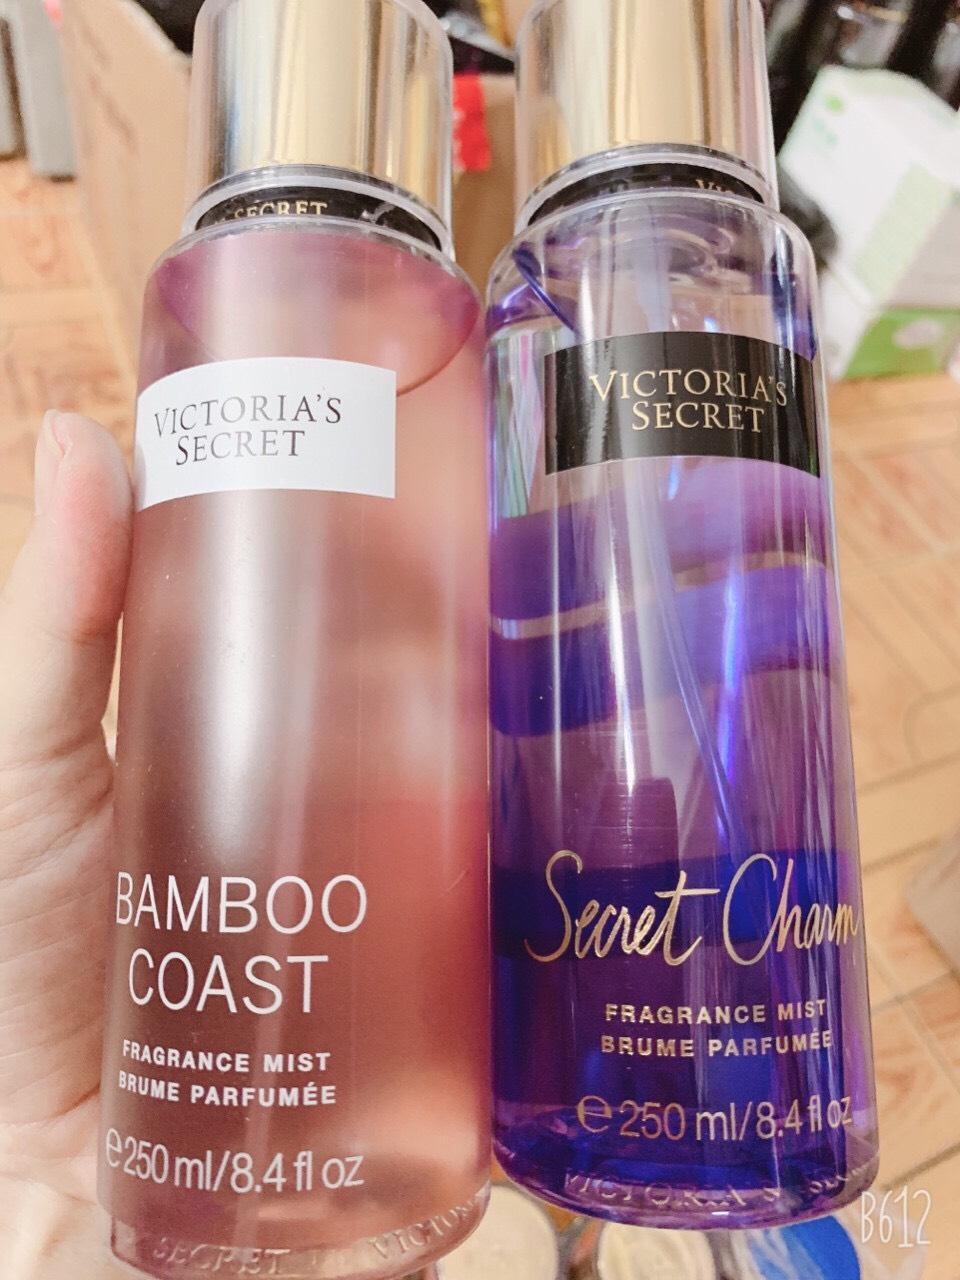 Xịt thơm body Victoria's Secret Mist 250ml (Đủ Mùi)